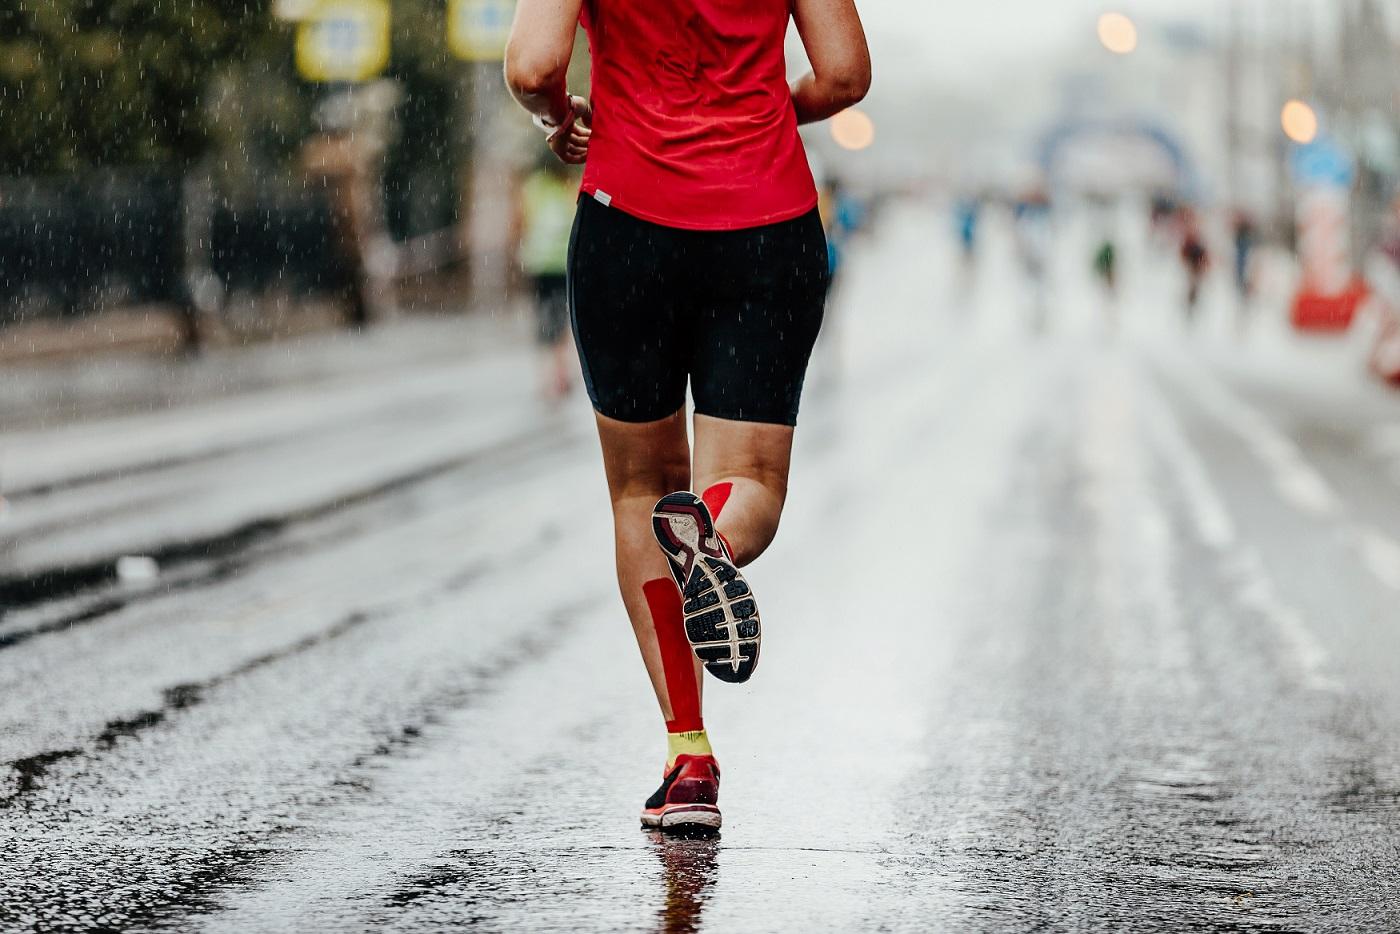 Mulher correndo maratona